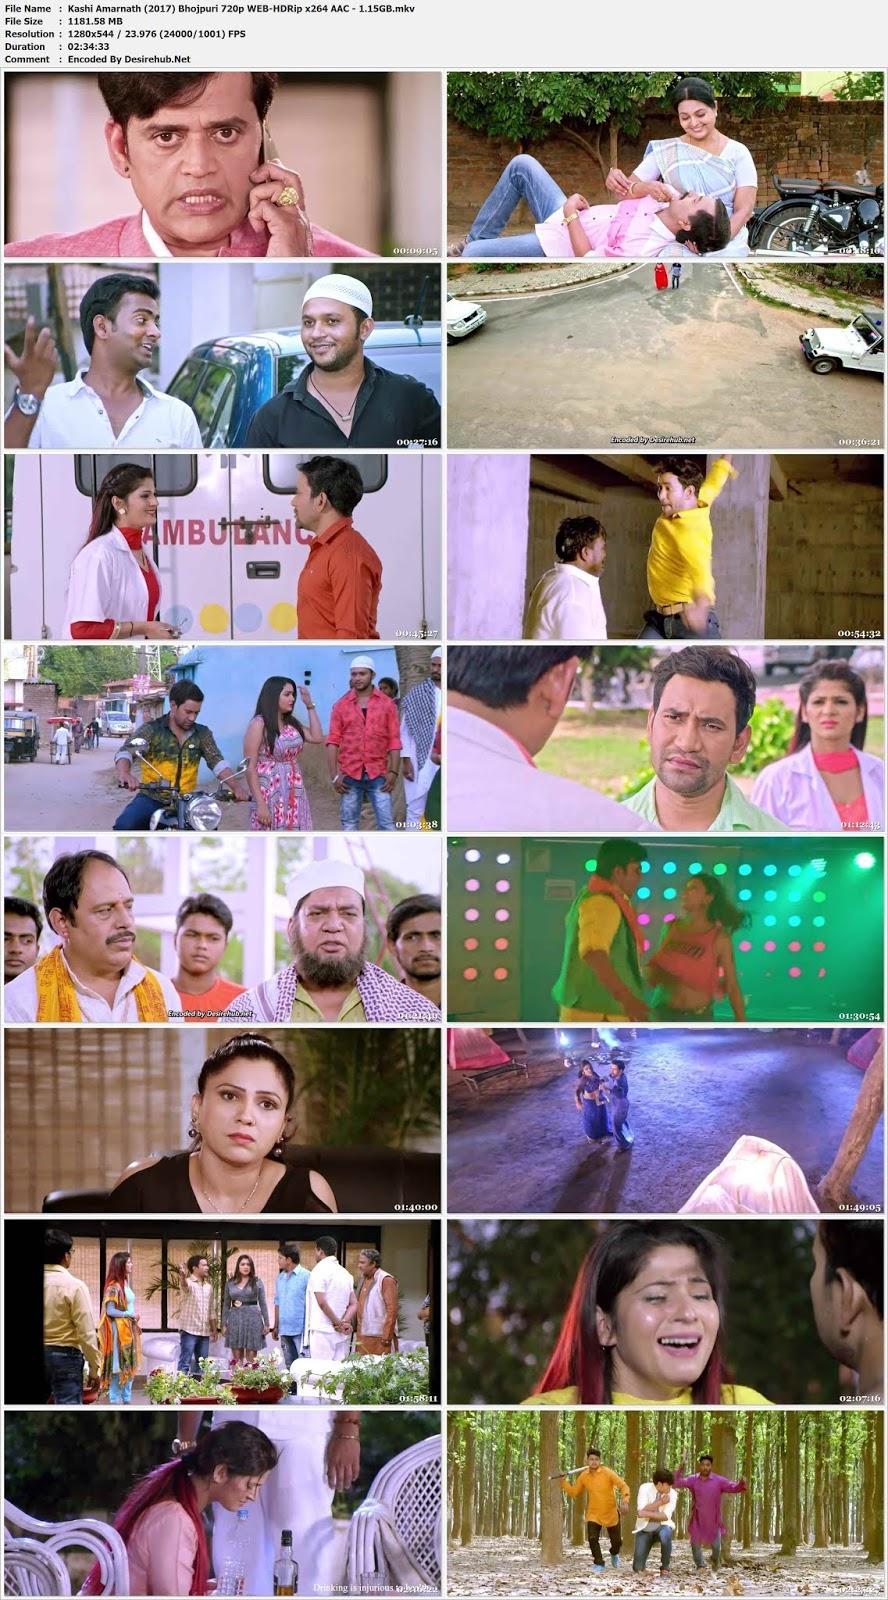 Kaashi Amarnath (2017) Bhojpuri 720p WEB-HDRip x264 AAC – 1.15GB Desirehub